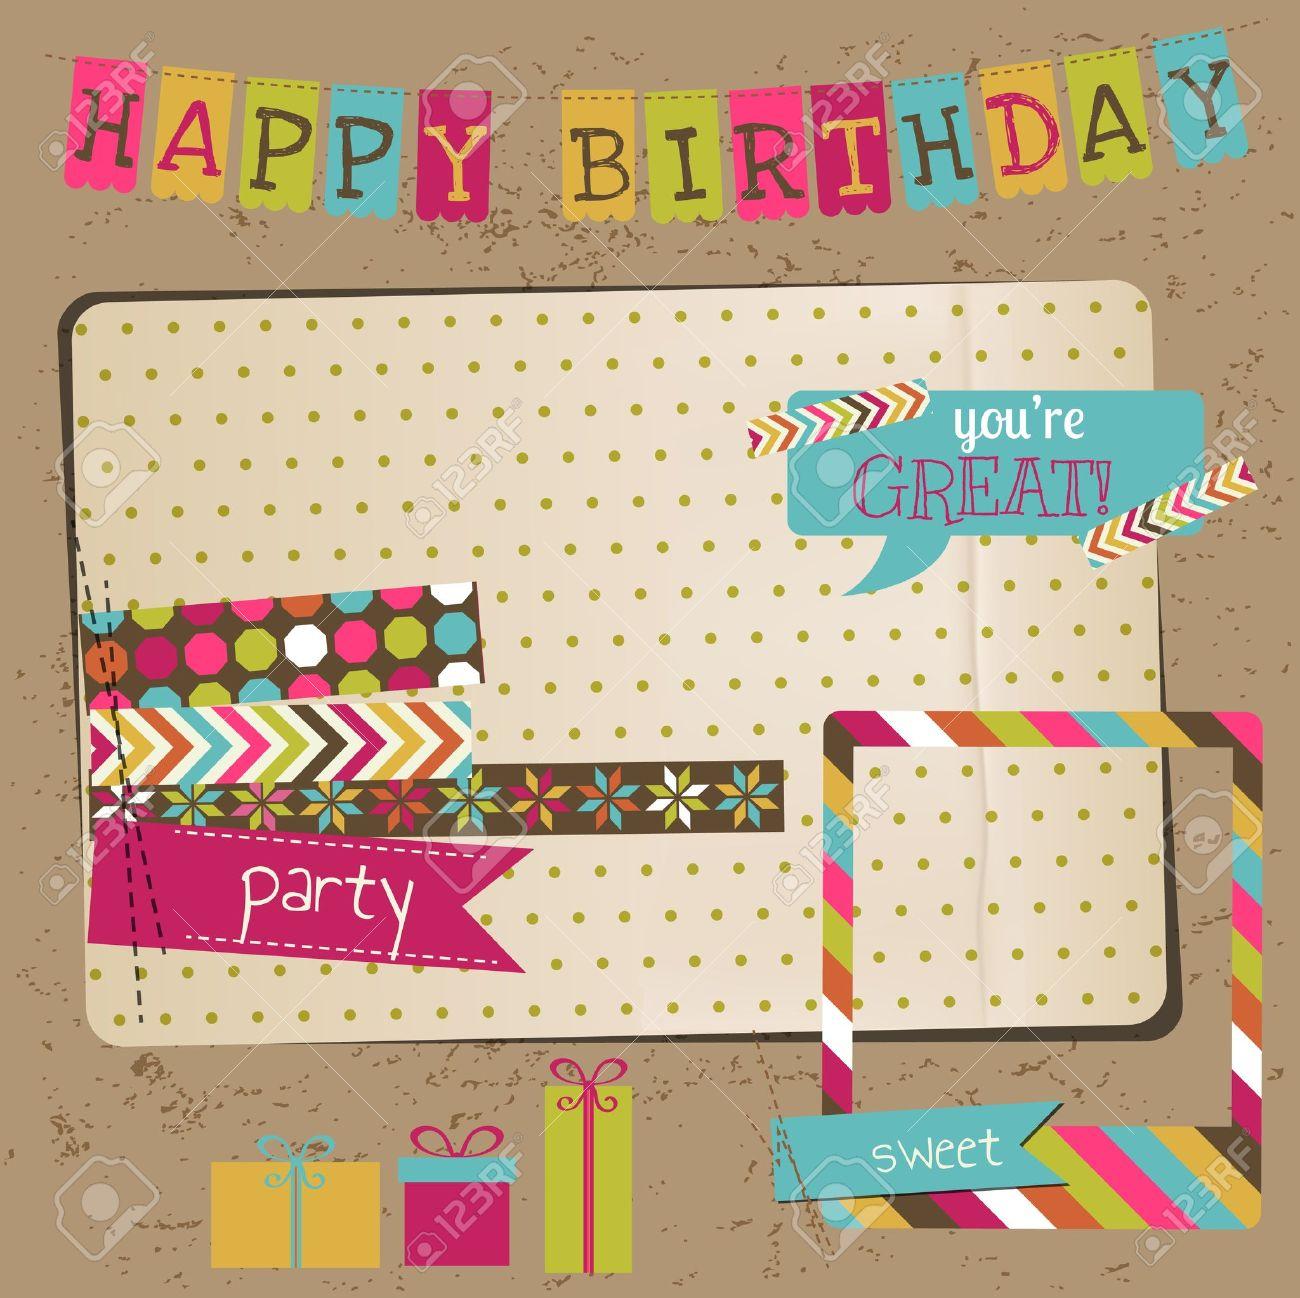 Retro Birthday Celebration Design Elements - for Scrapbook, Invitation in vector Stock Vector - 16401967